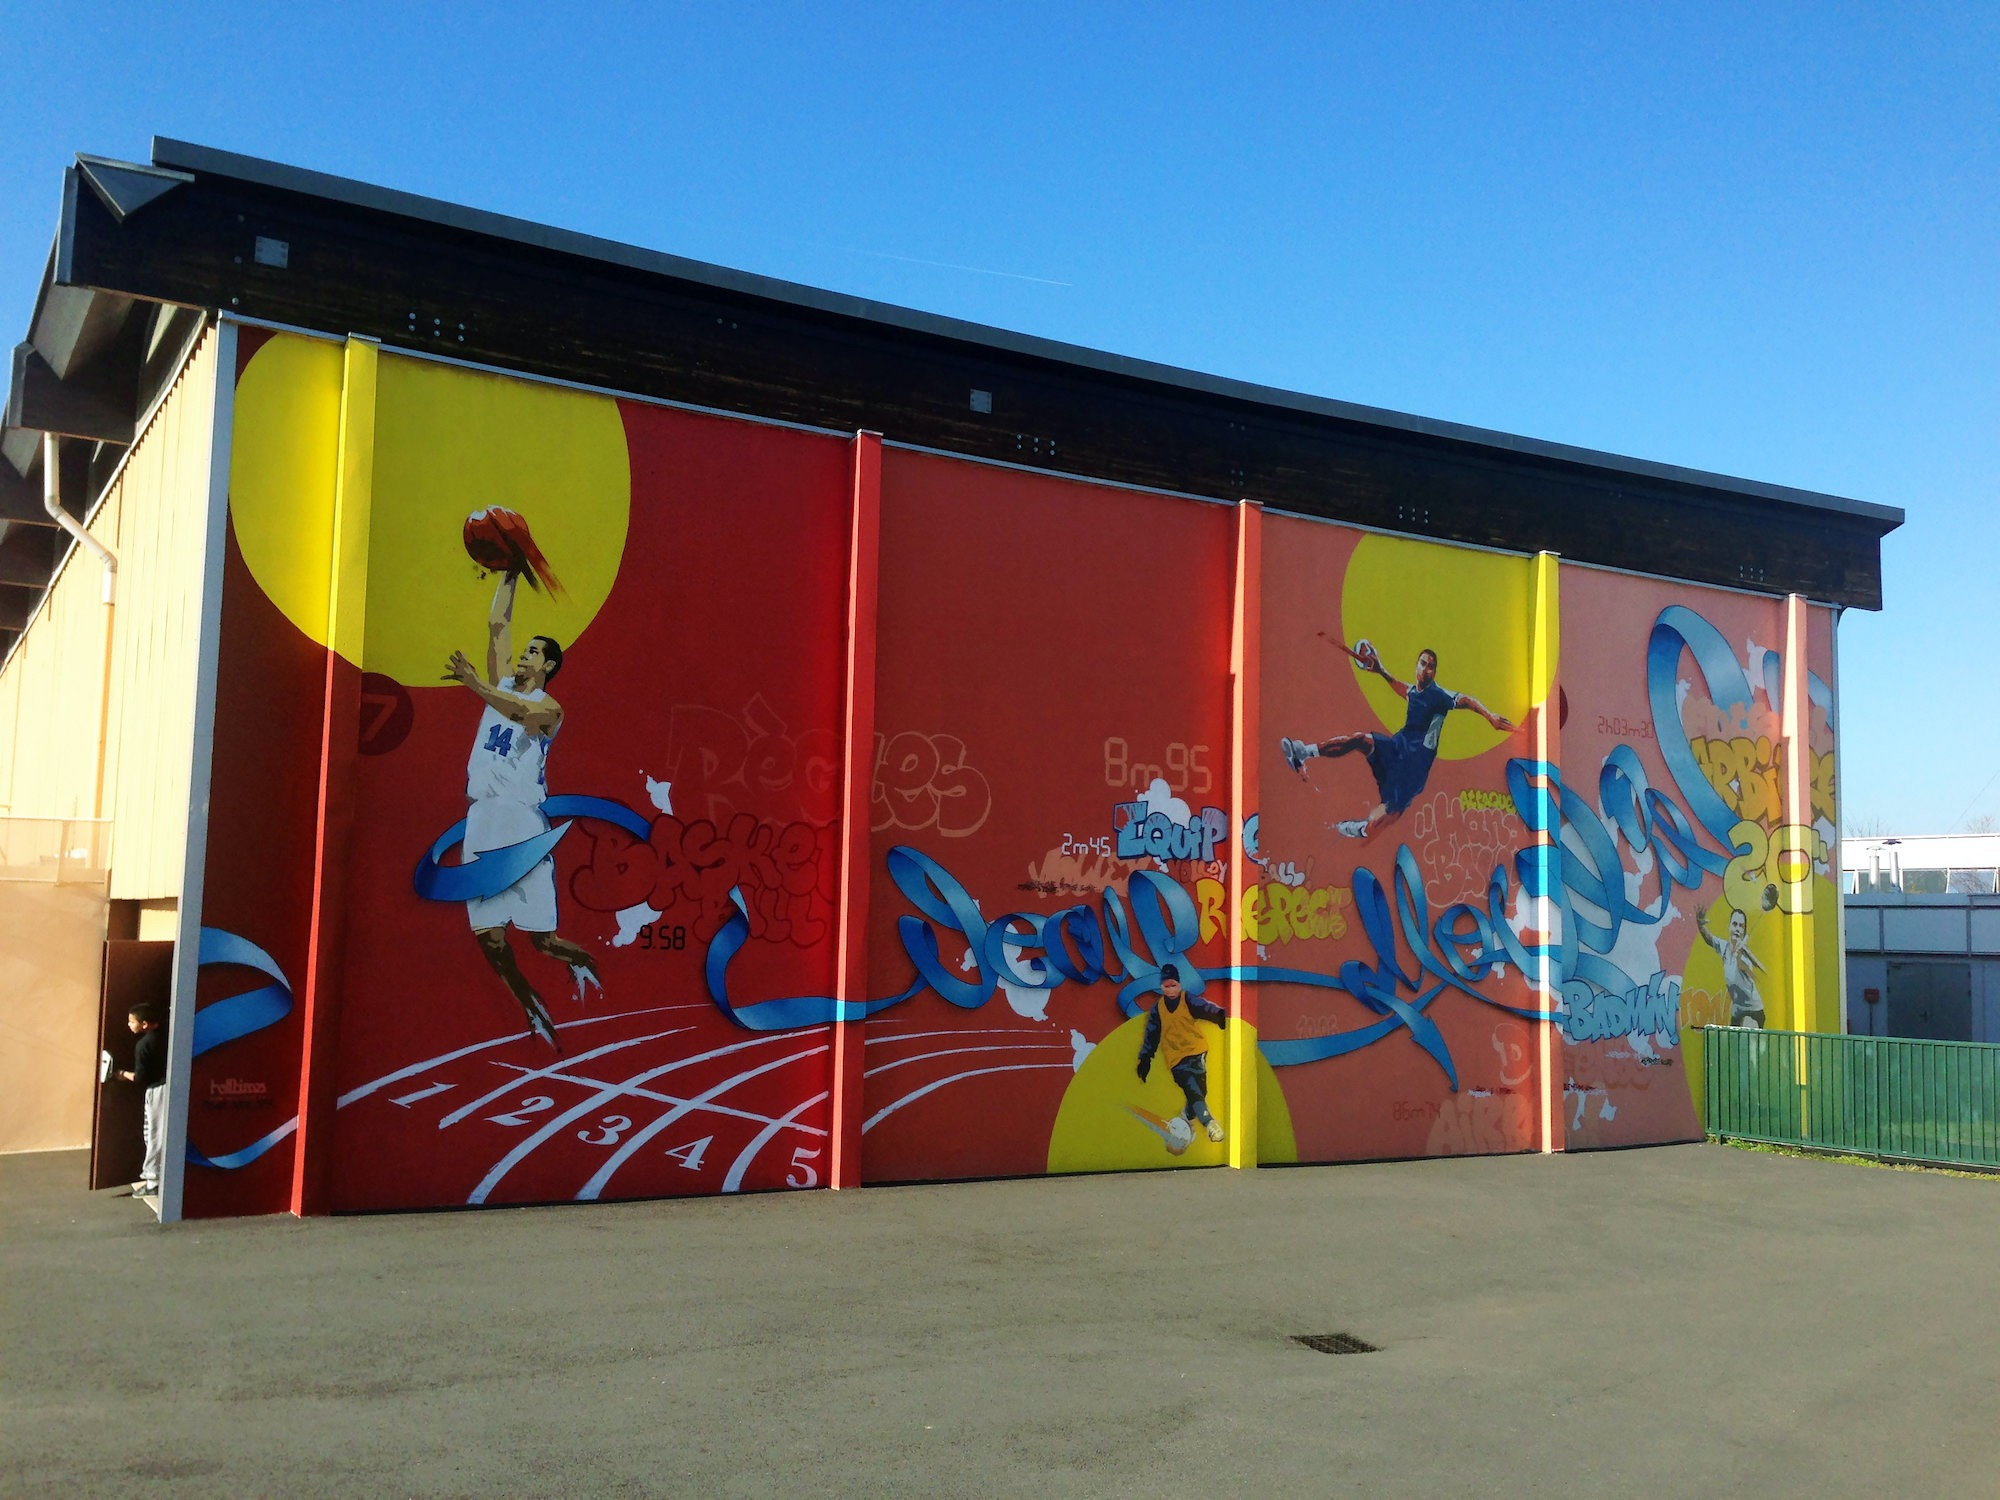 fresque gymnase ecole julesjulien toulouse sport graffiti